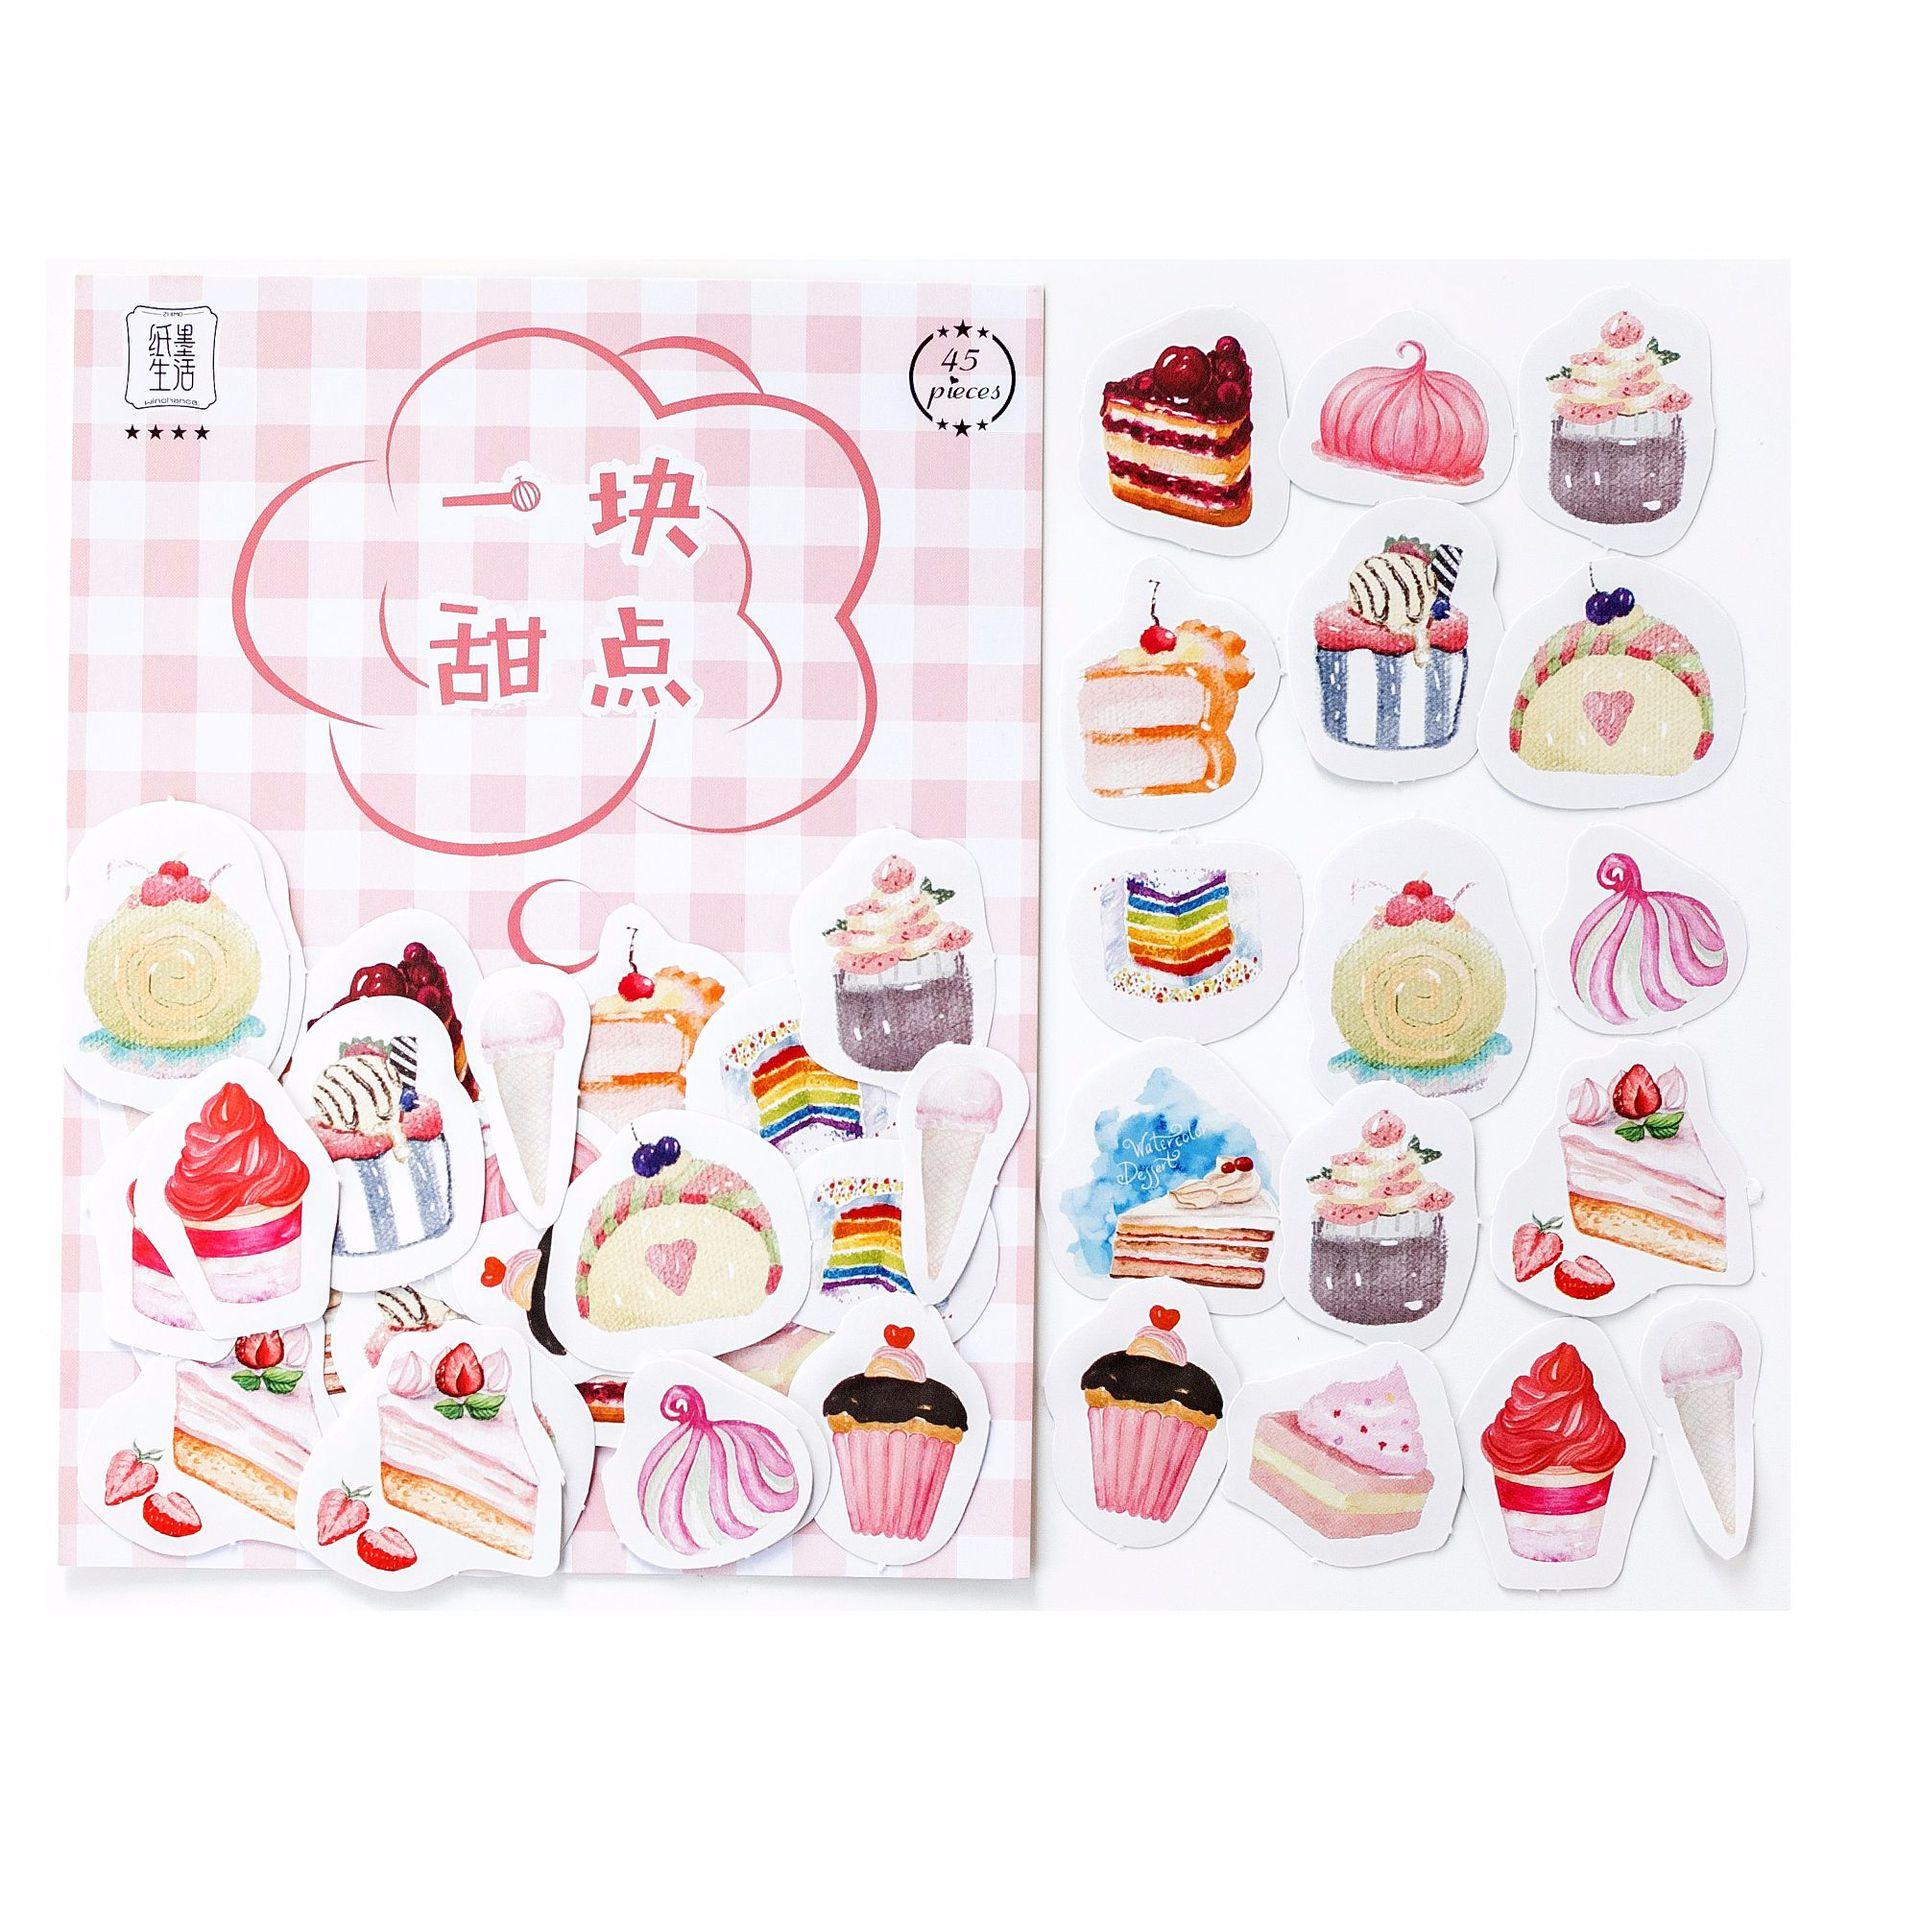 Купить с кэшбэком Washi Paper Stickers Pack Sweet Small Daily Series Creative Techo Decorative Stickers